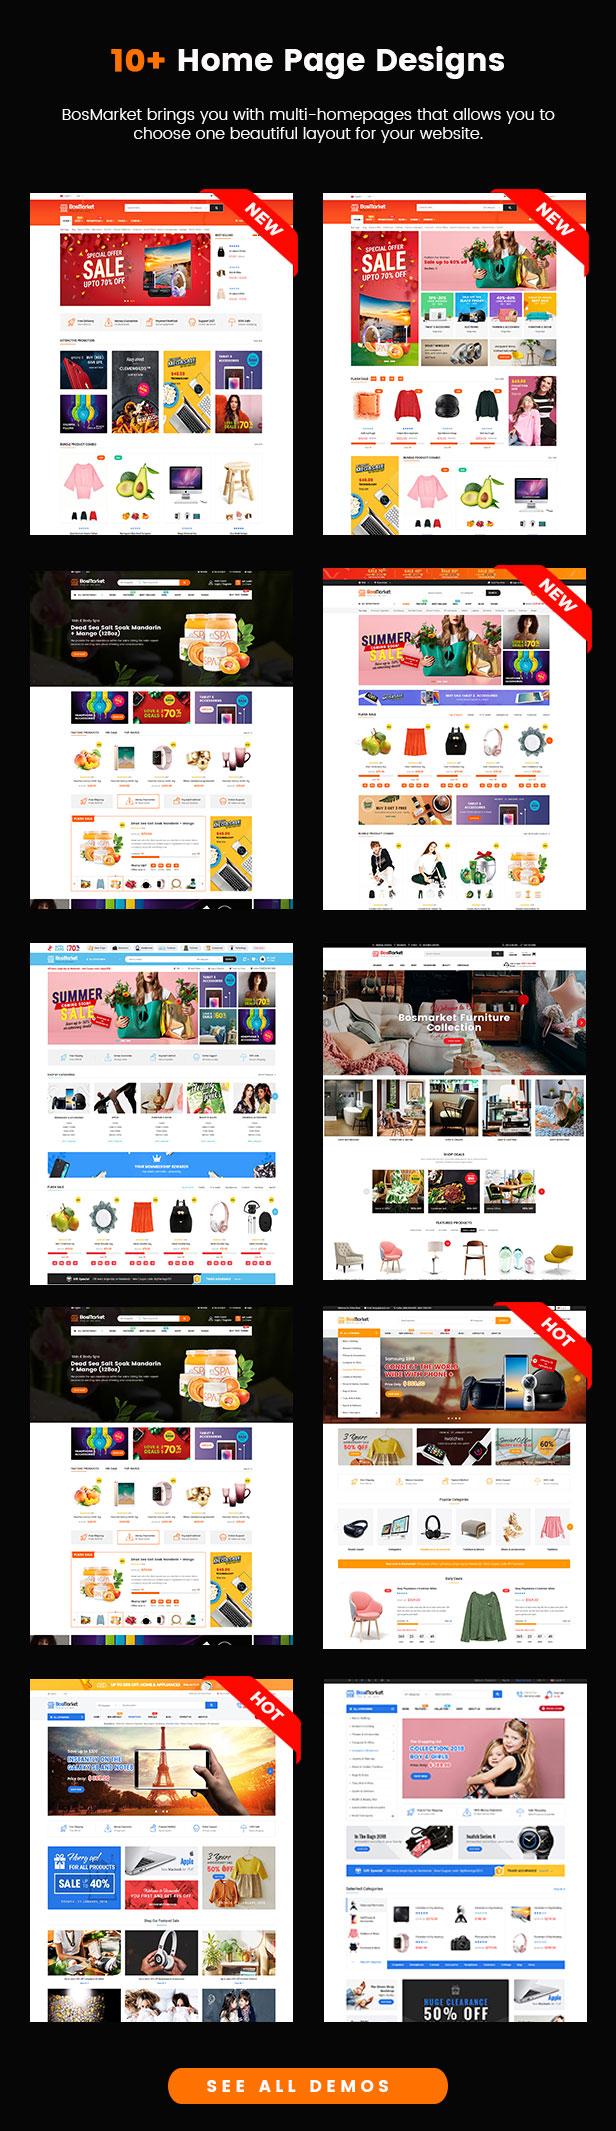 SW BosMarket - WooCommerce Theme